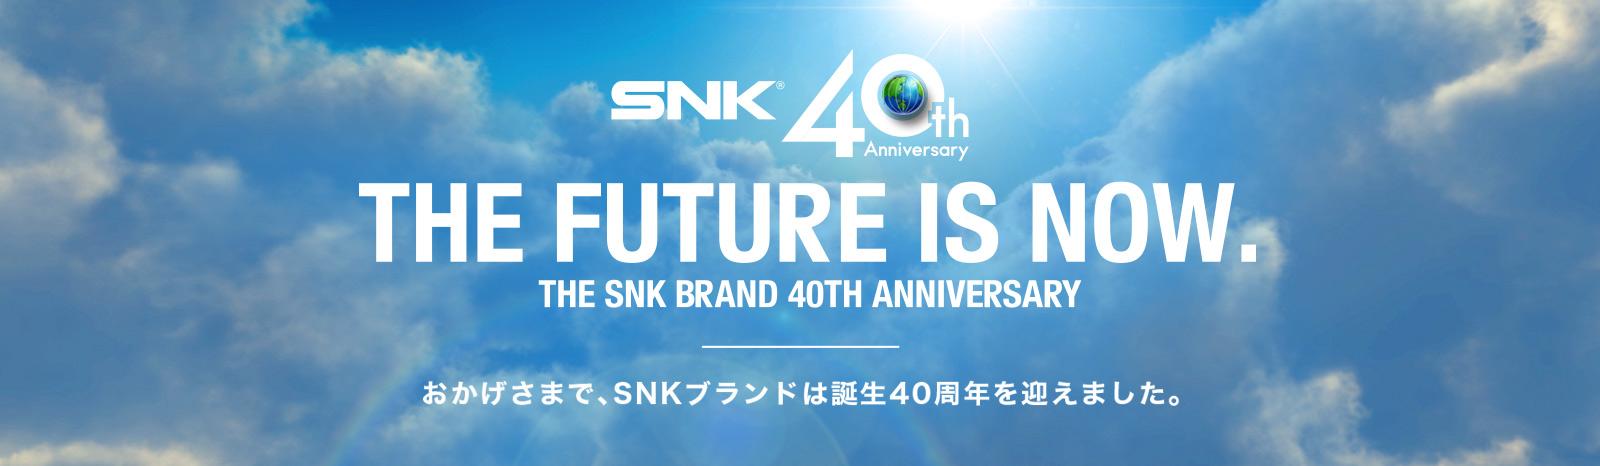 SNK40周年